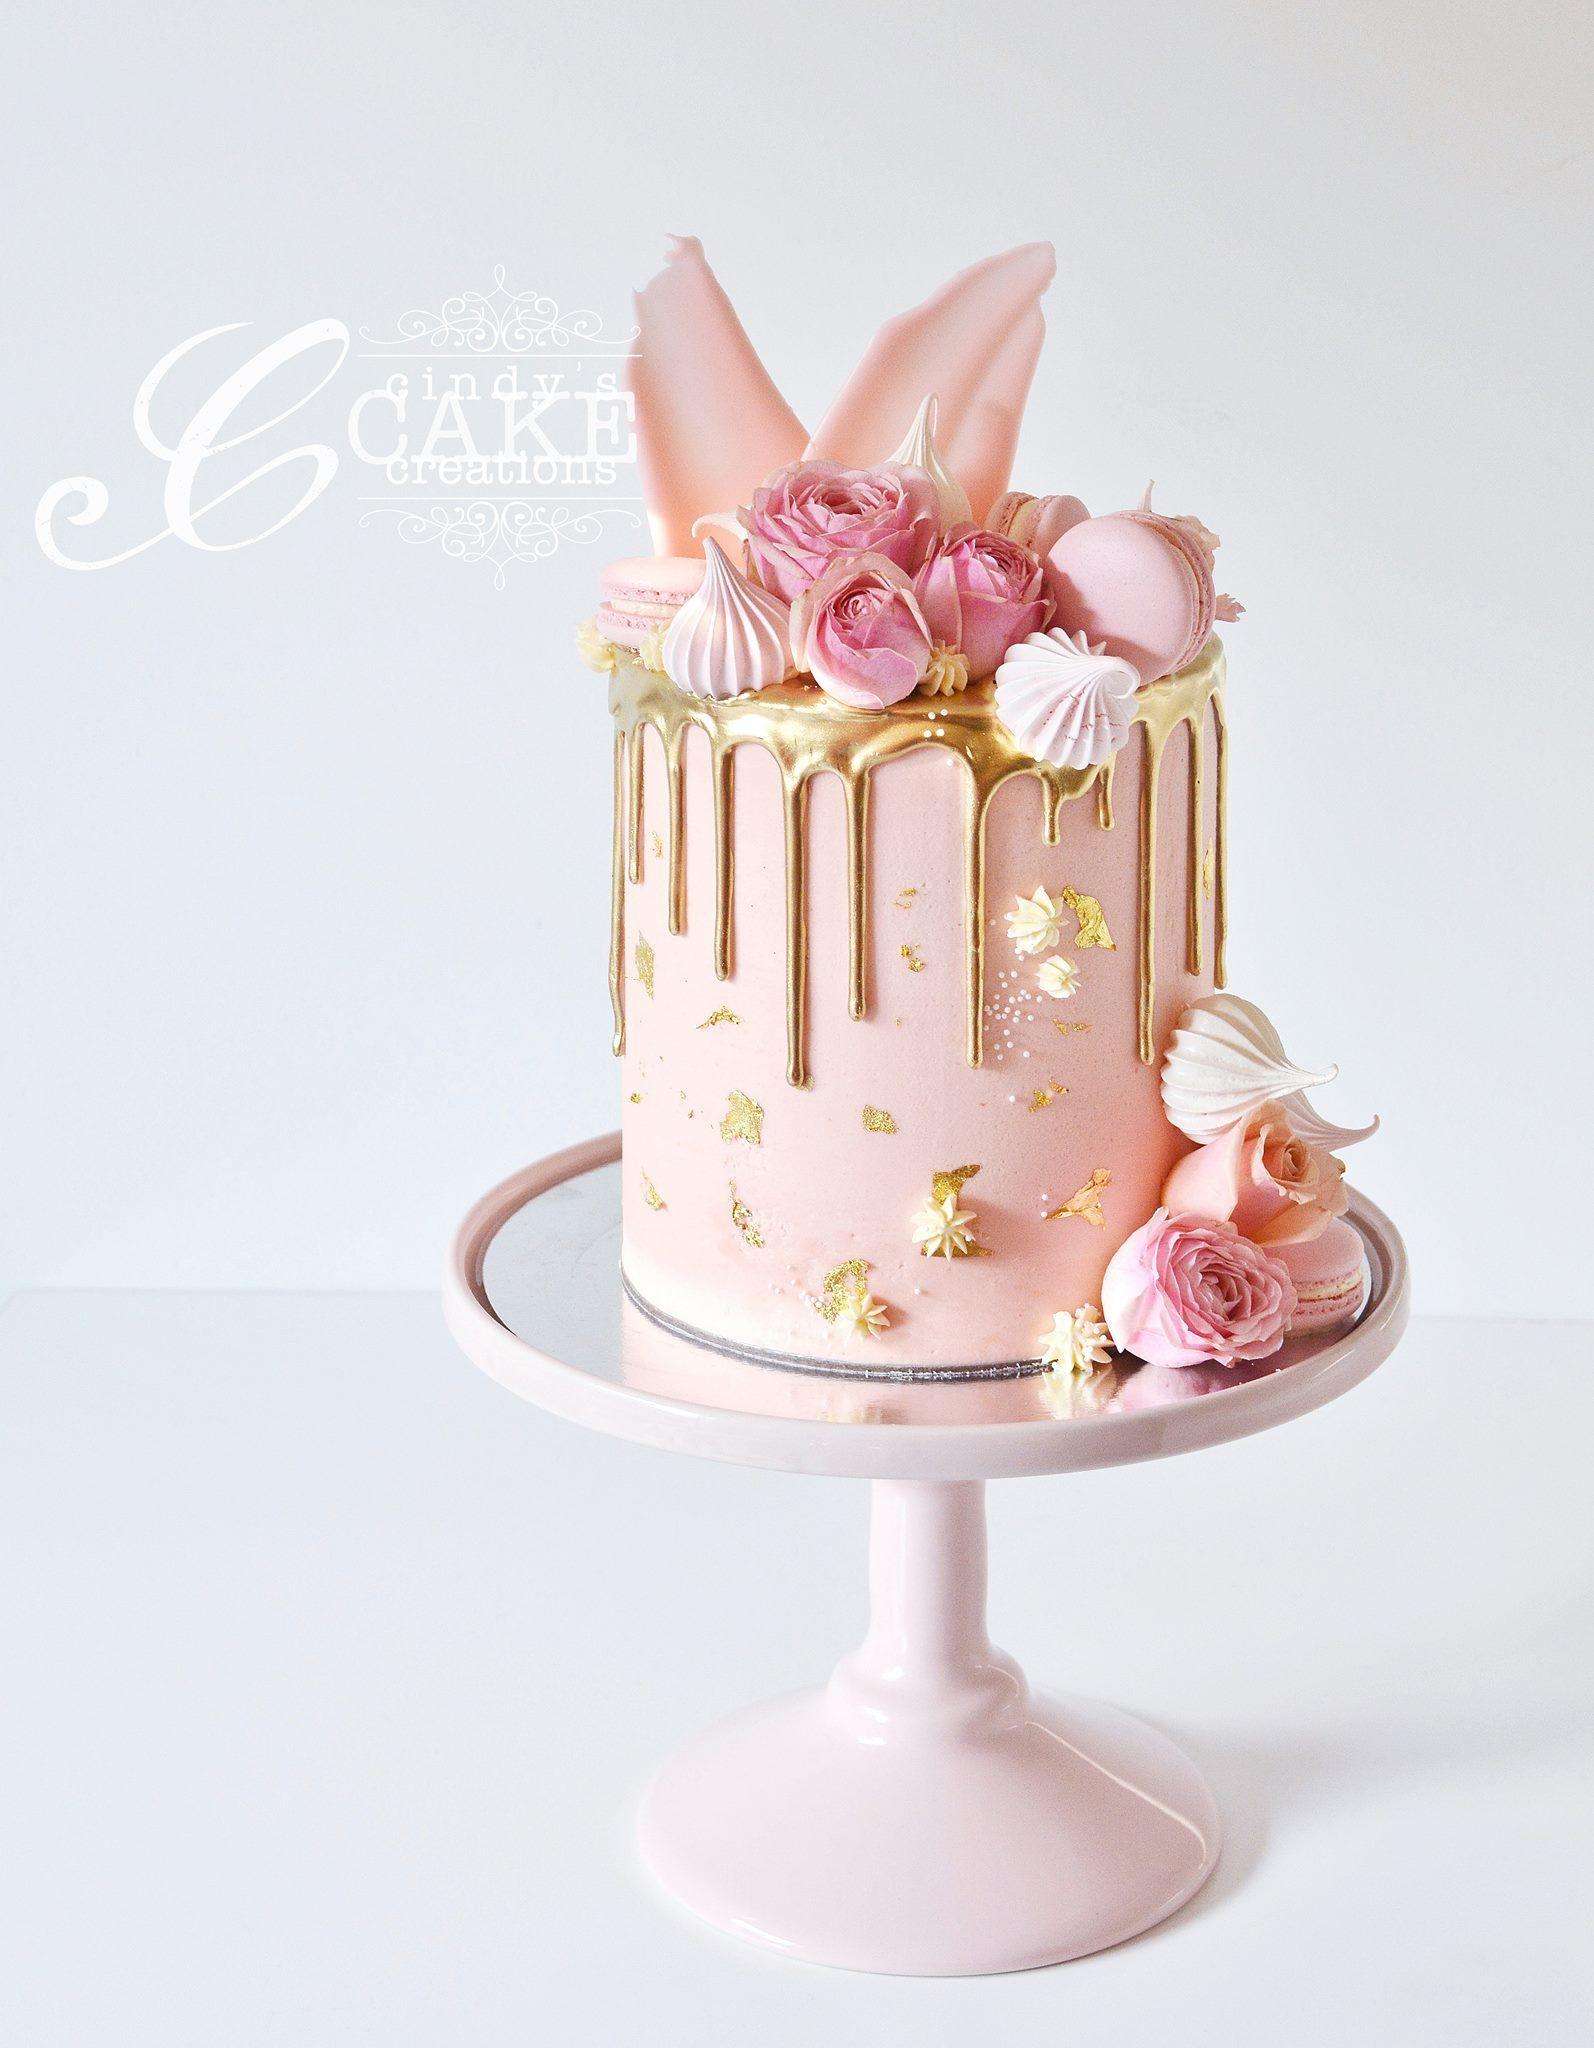 Cindys Cake Creations Cakes Pink Pinterest Cake Drip Cakes